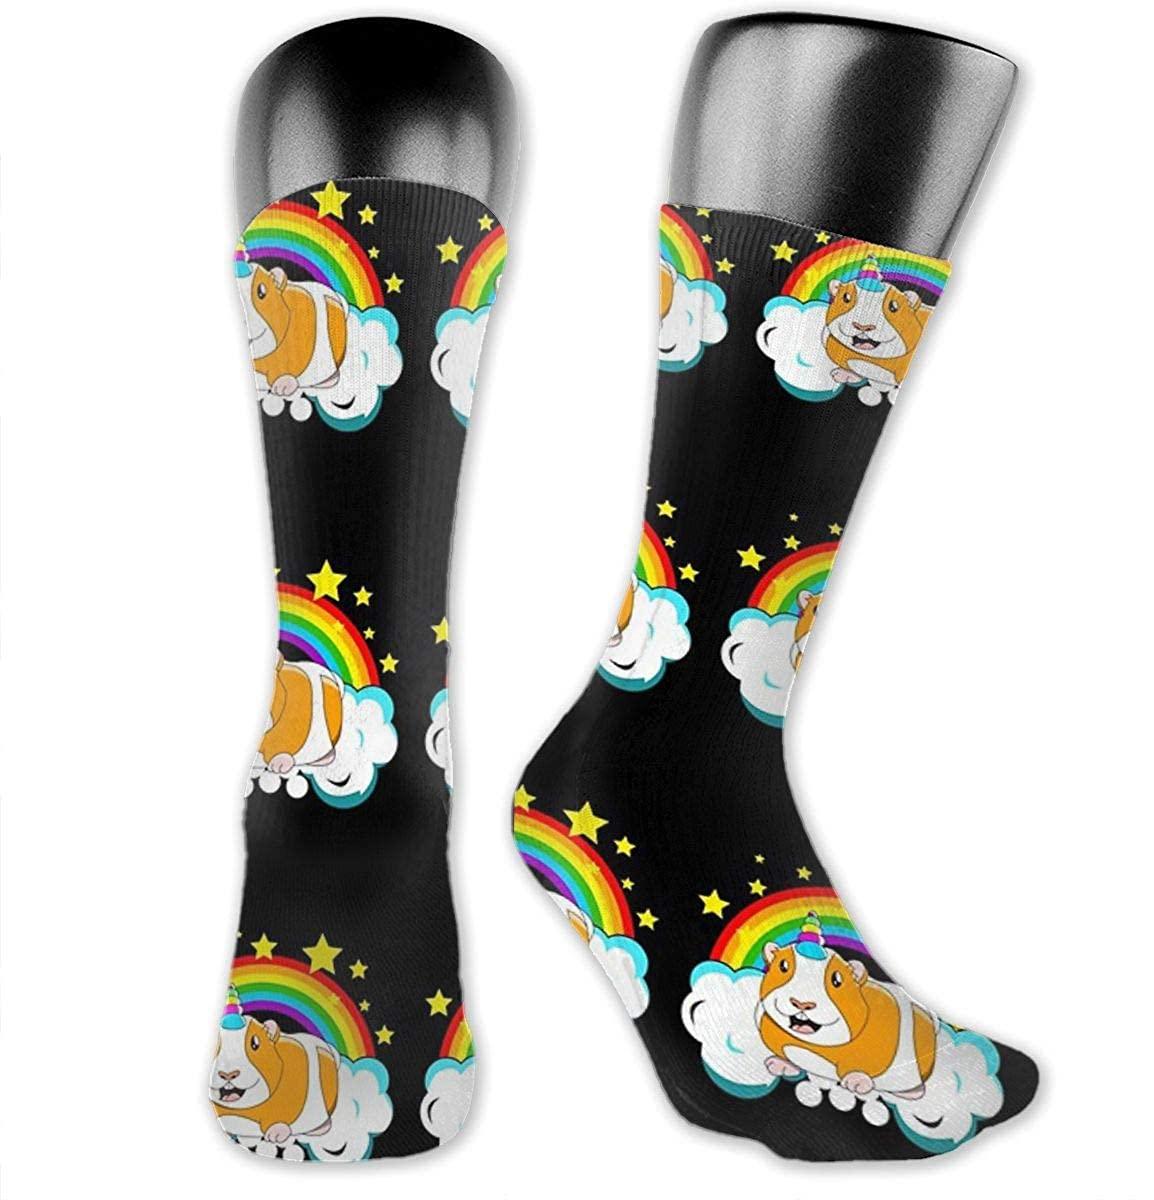 Unisex Crazy Funny Cool 3D Print Unicorn Rainbow Socks Colorful Running Sport Socks Novelty Casual Crew Socks